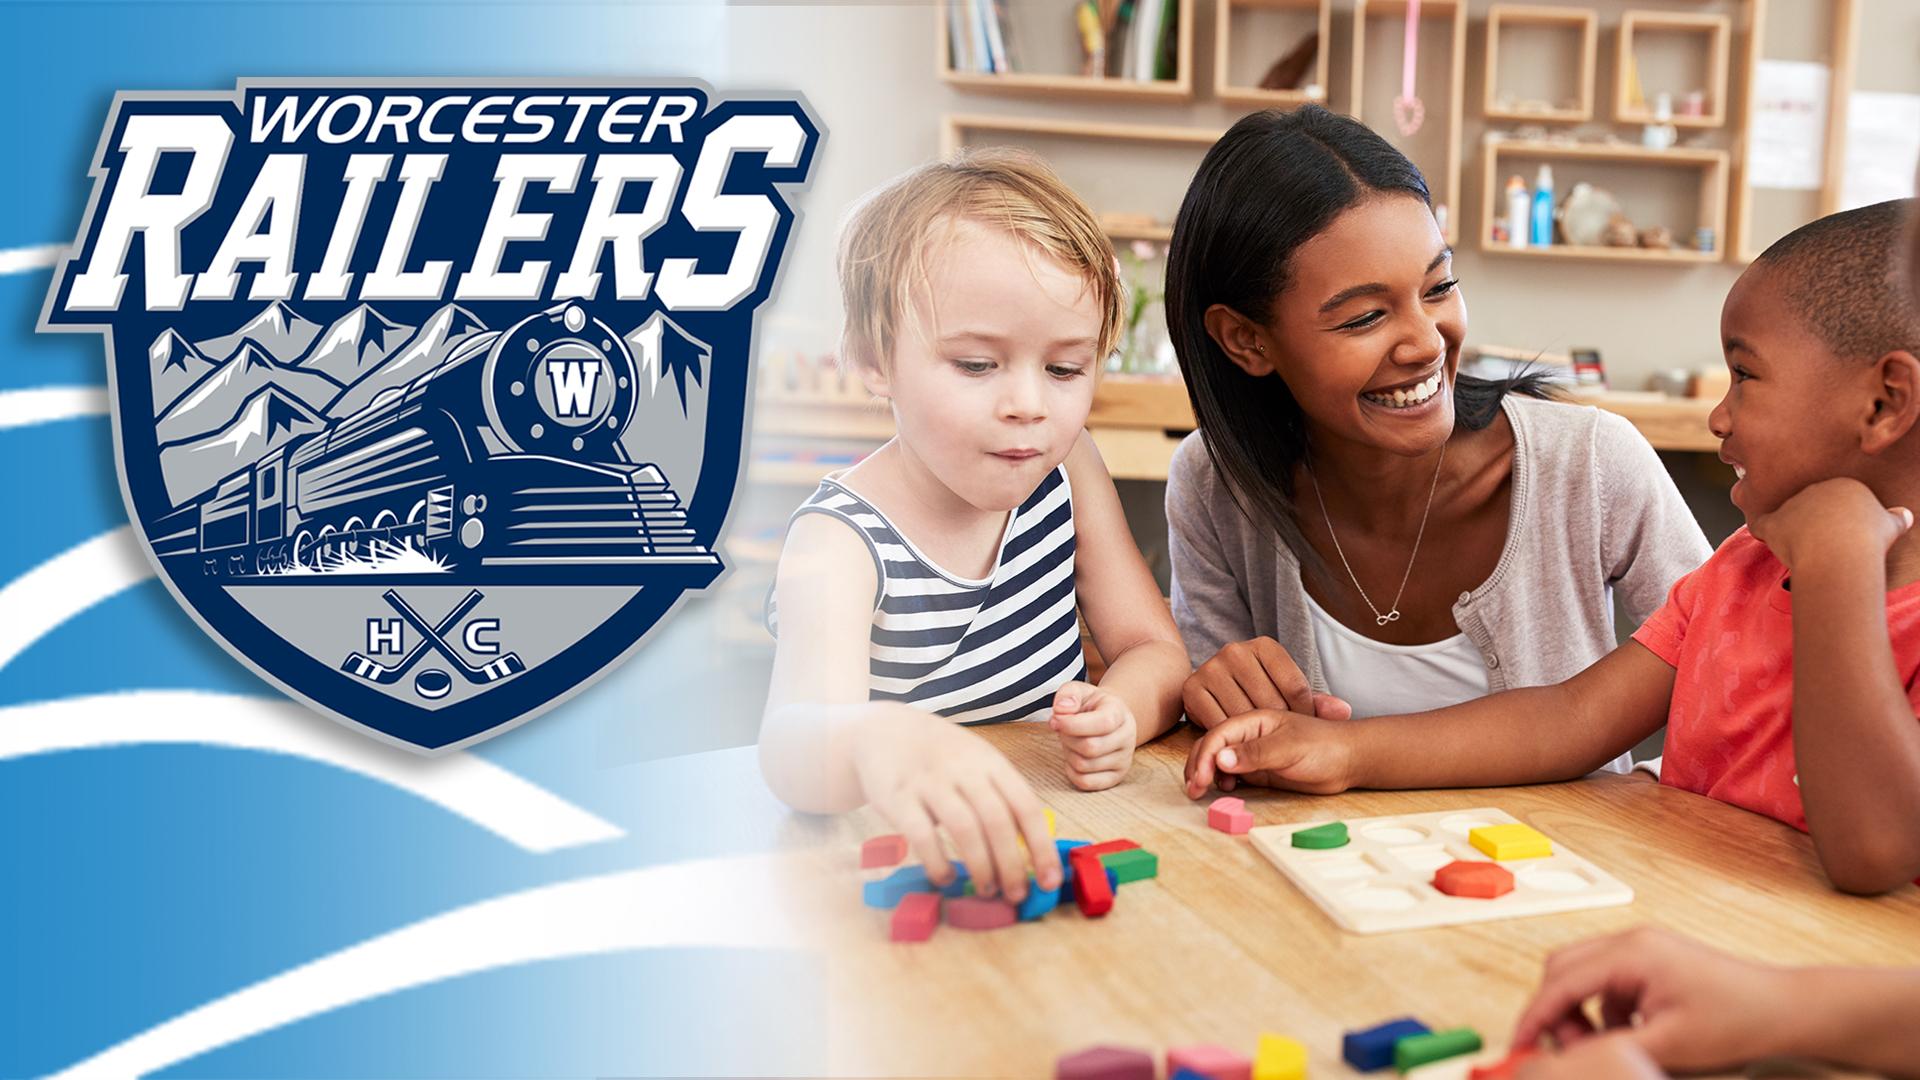 Worcester Railers HC, Great Community Partners